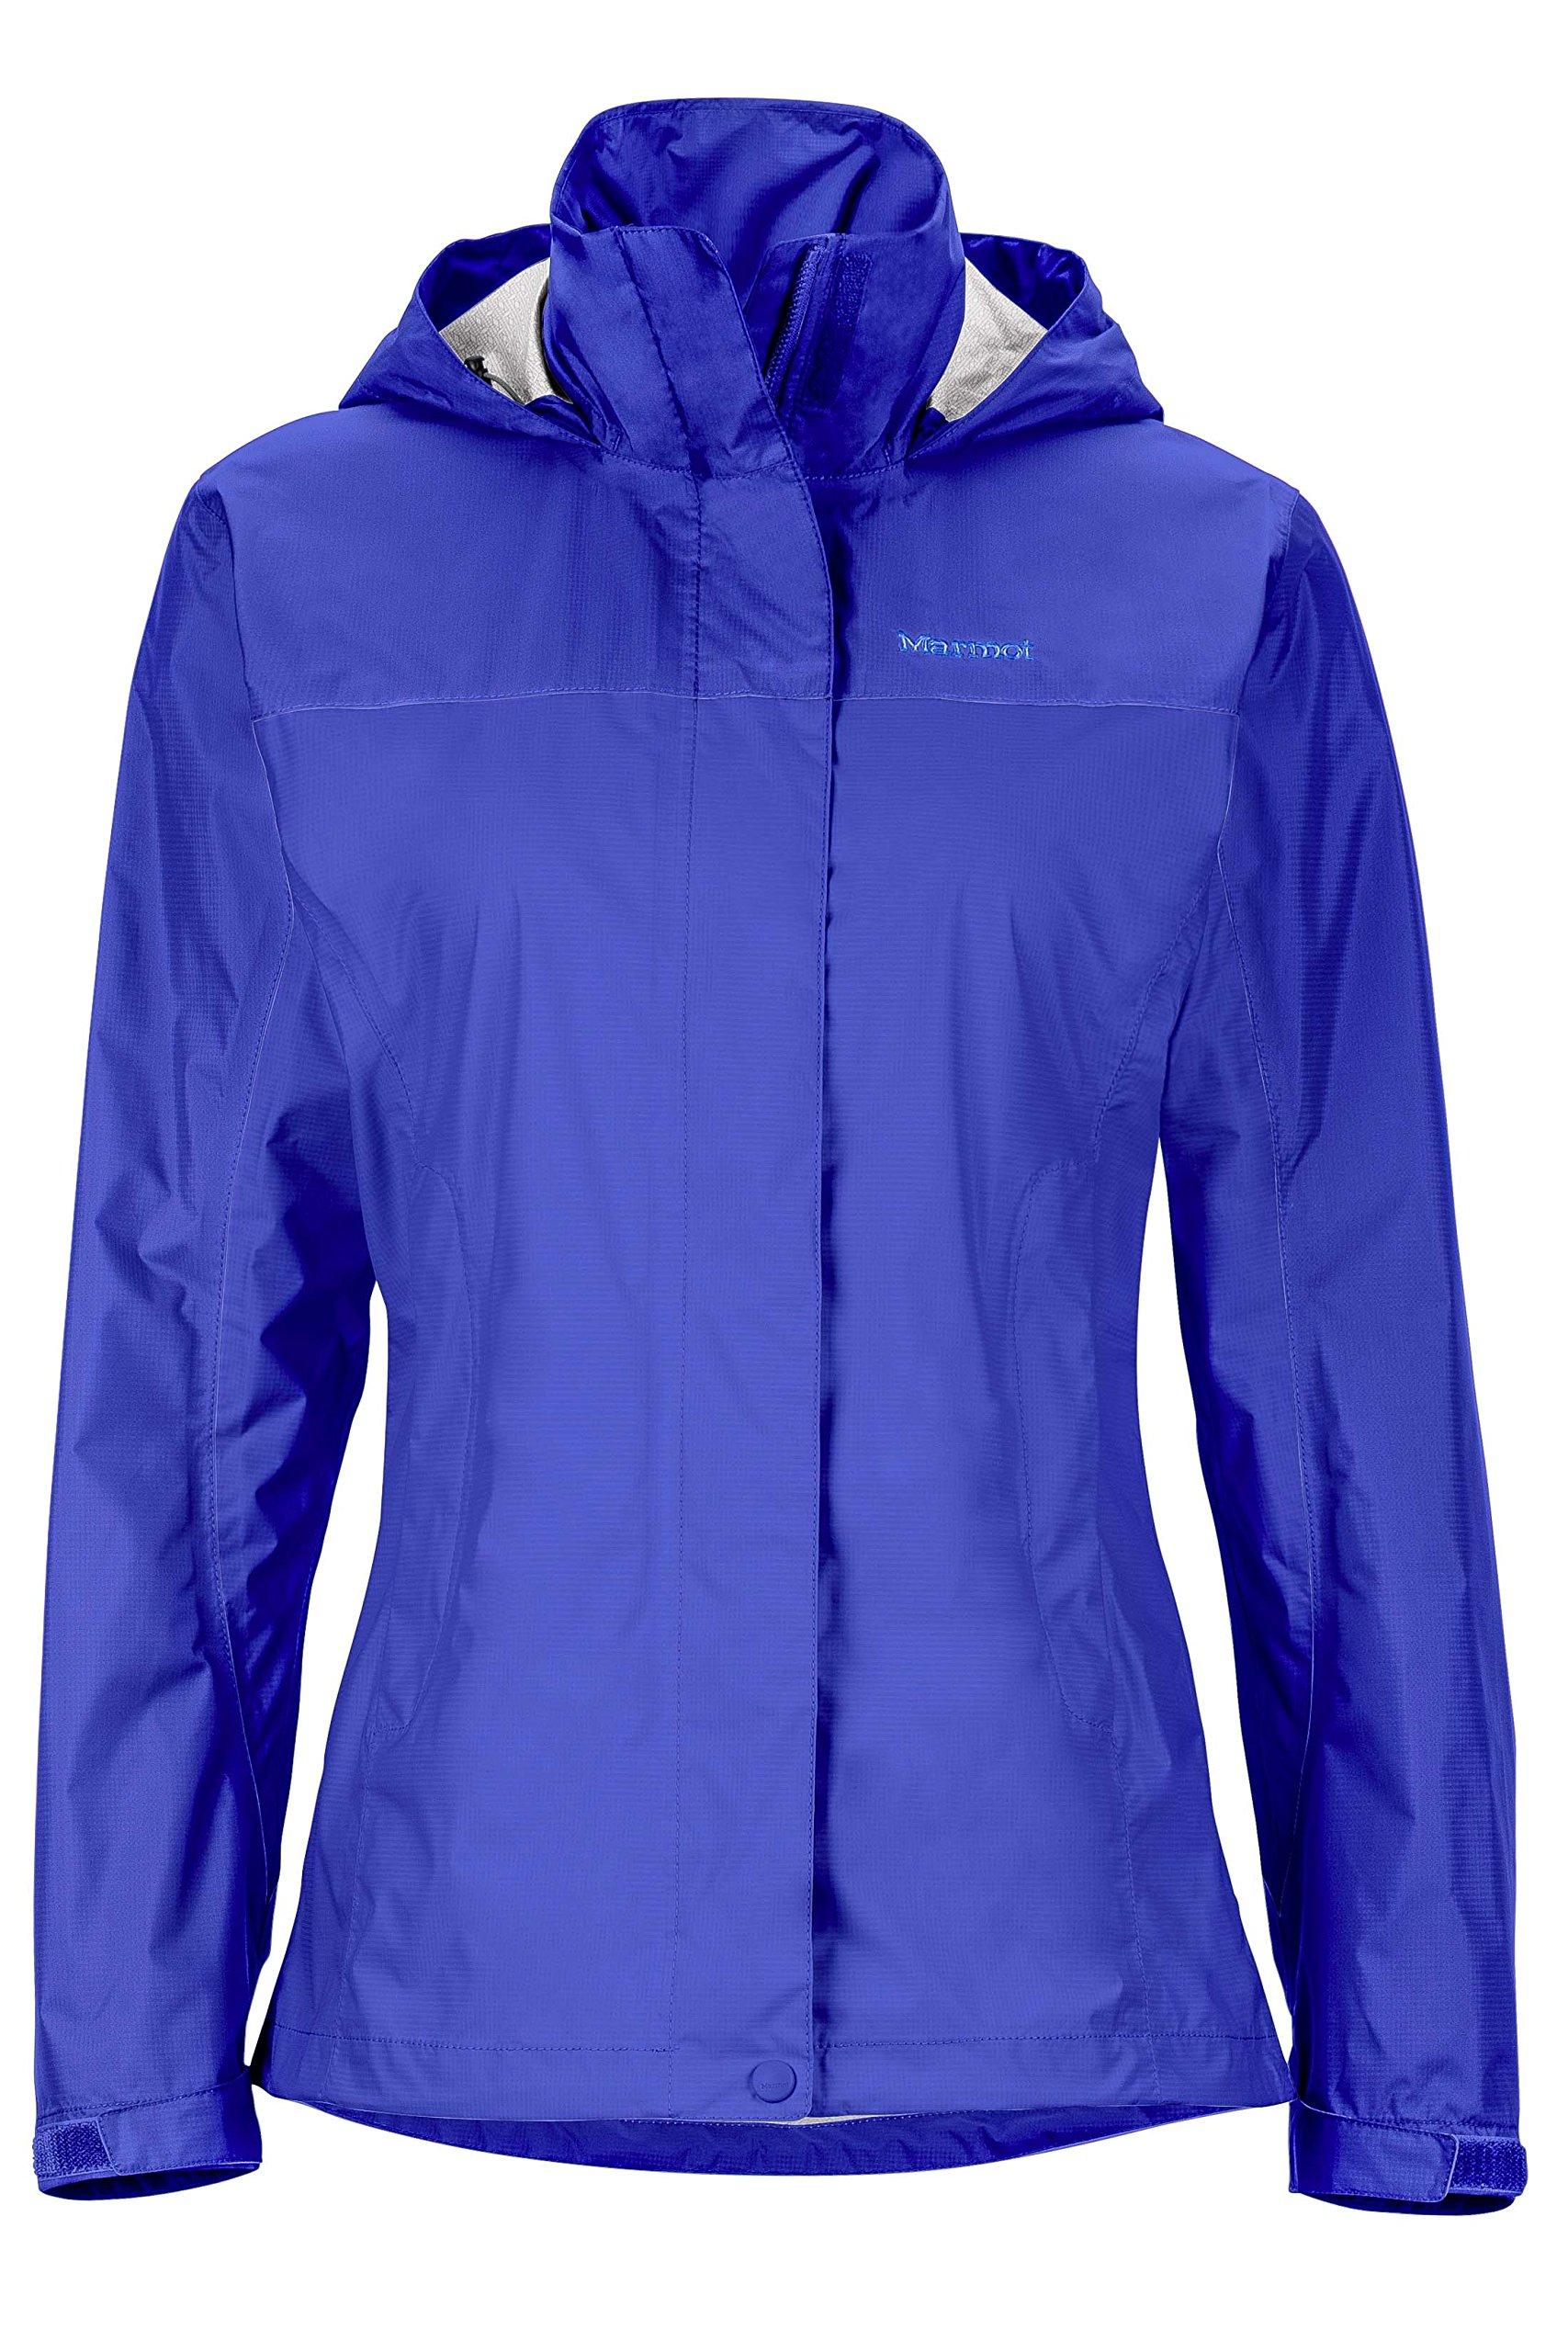 Marmot PreCip Women's Lightweight Waterproof Rain Jacket, Gemstone